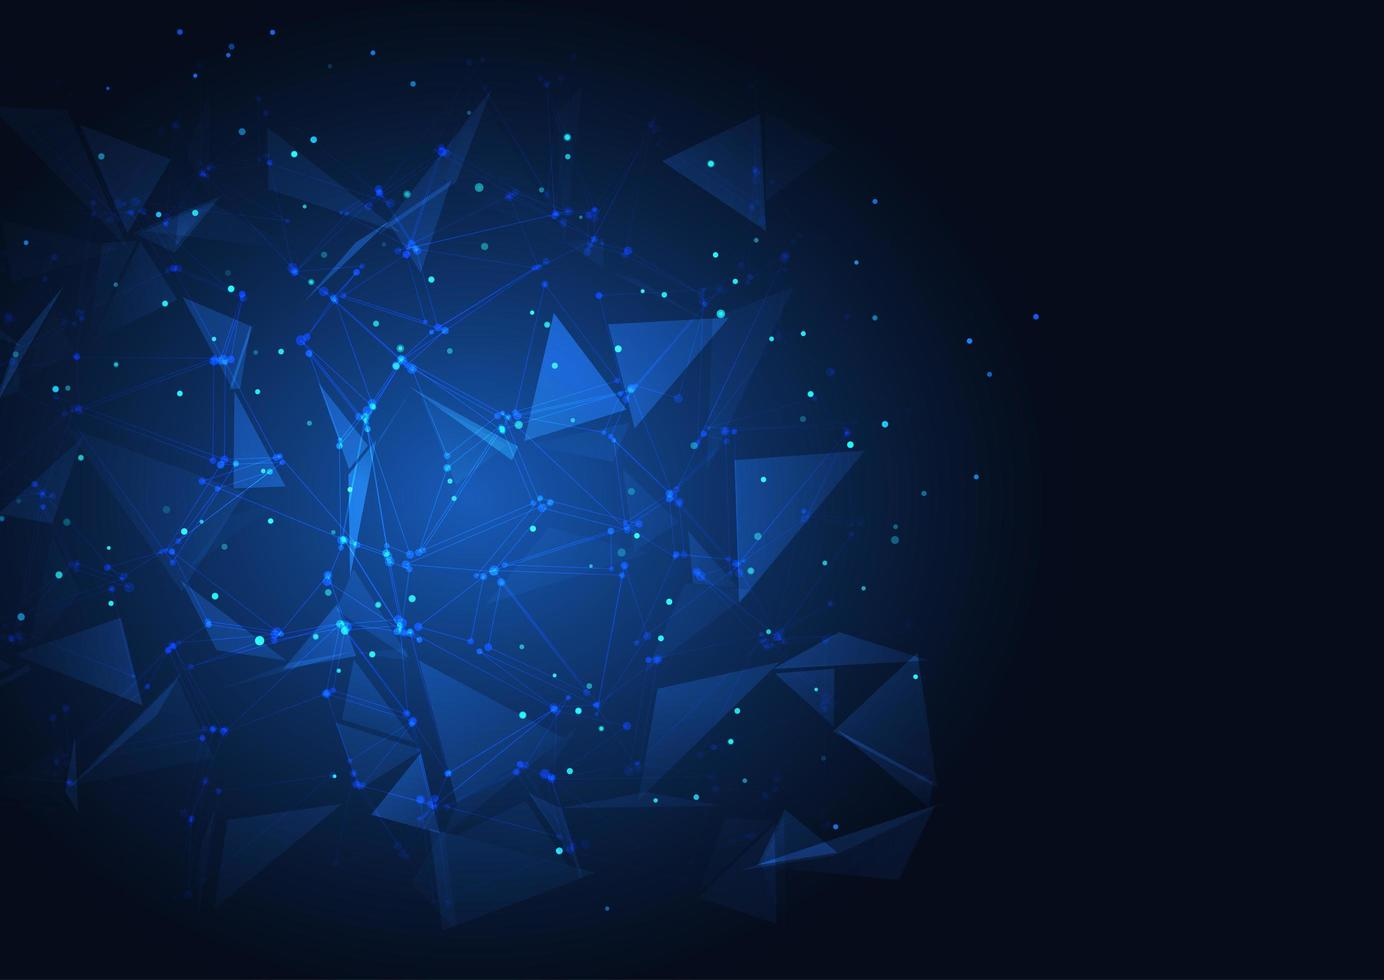 blaues Techno Low Poly Design vektor